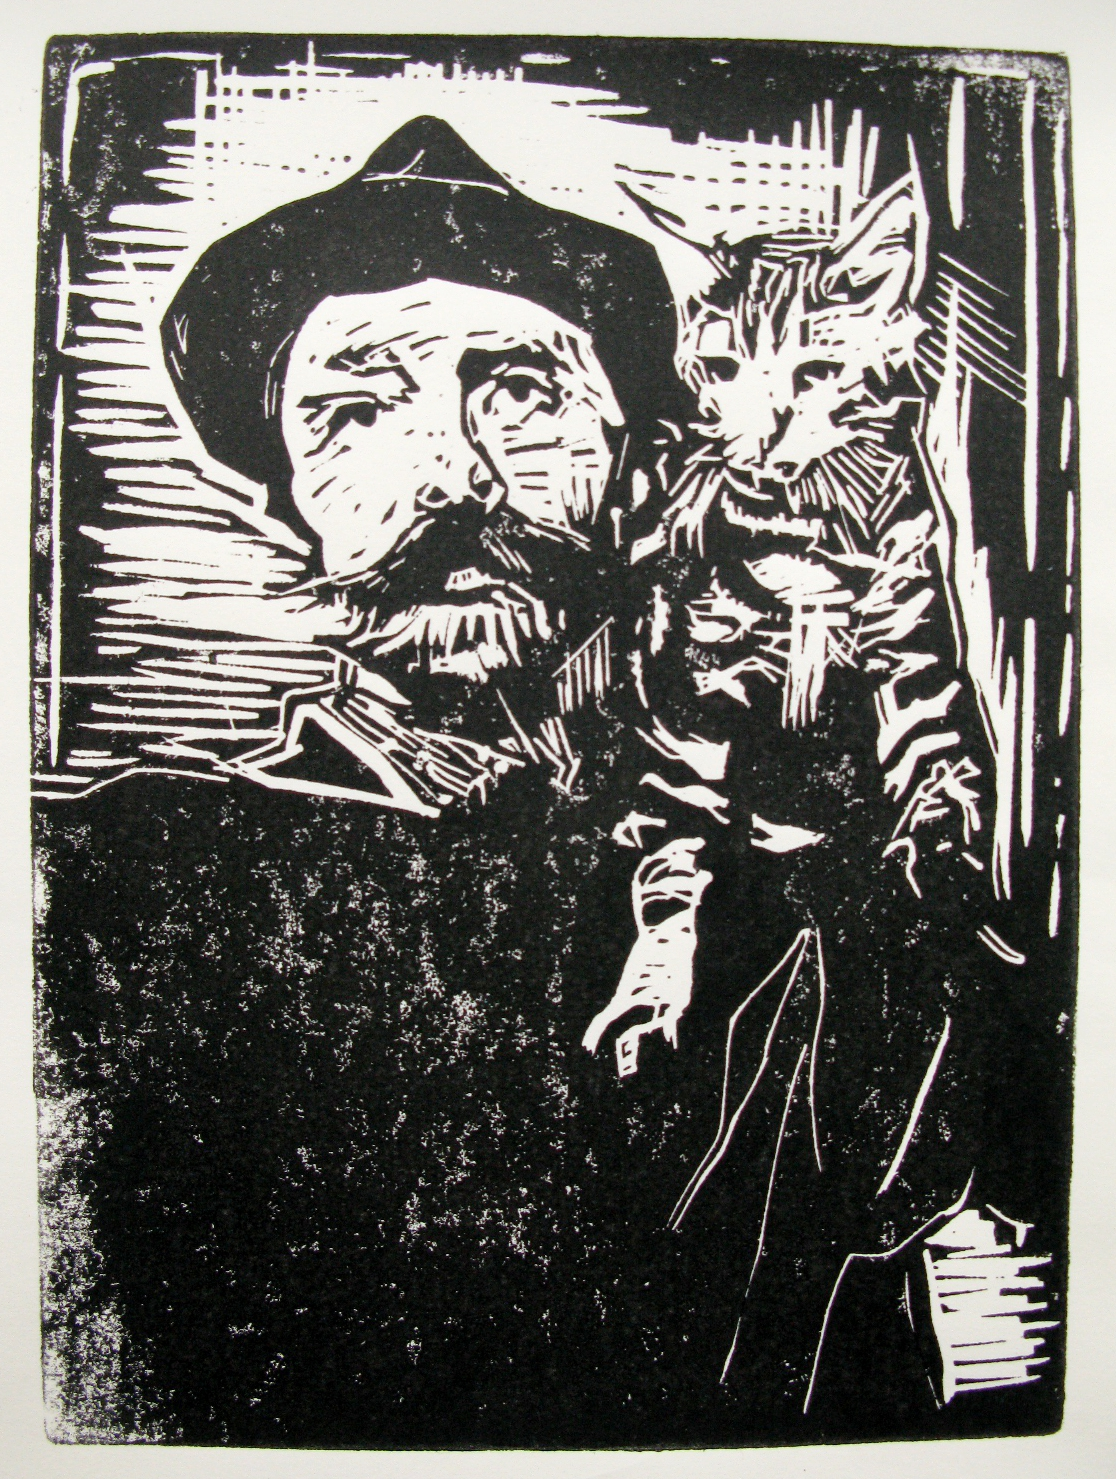 Billy Childish & Cat